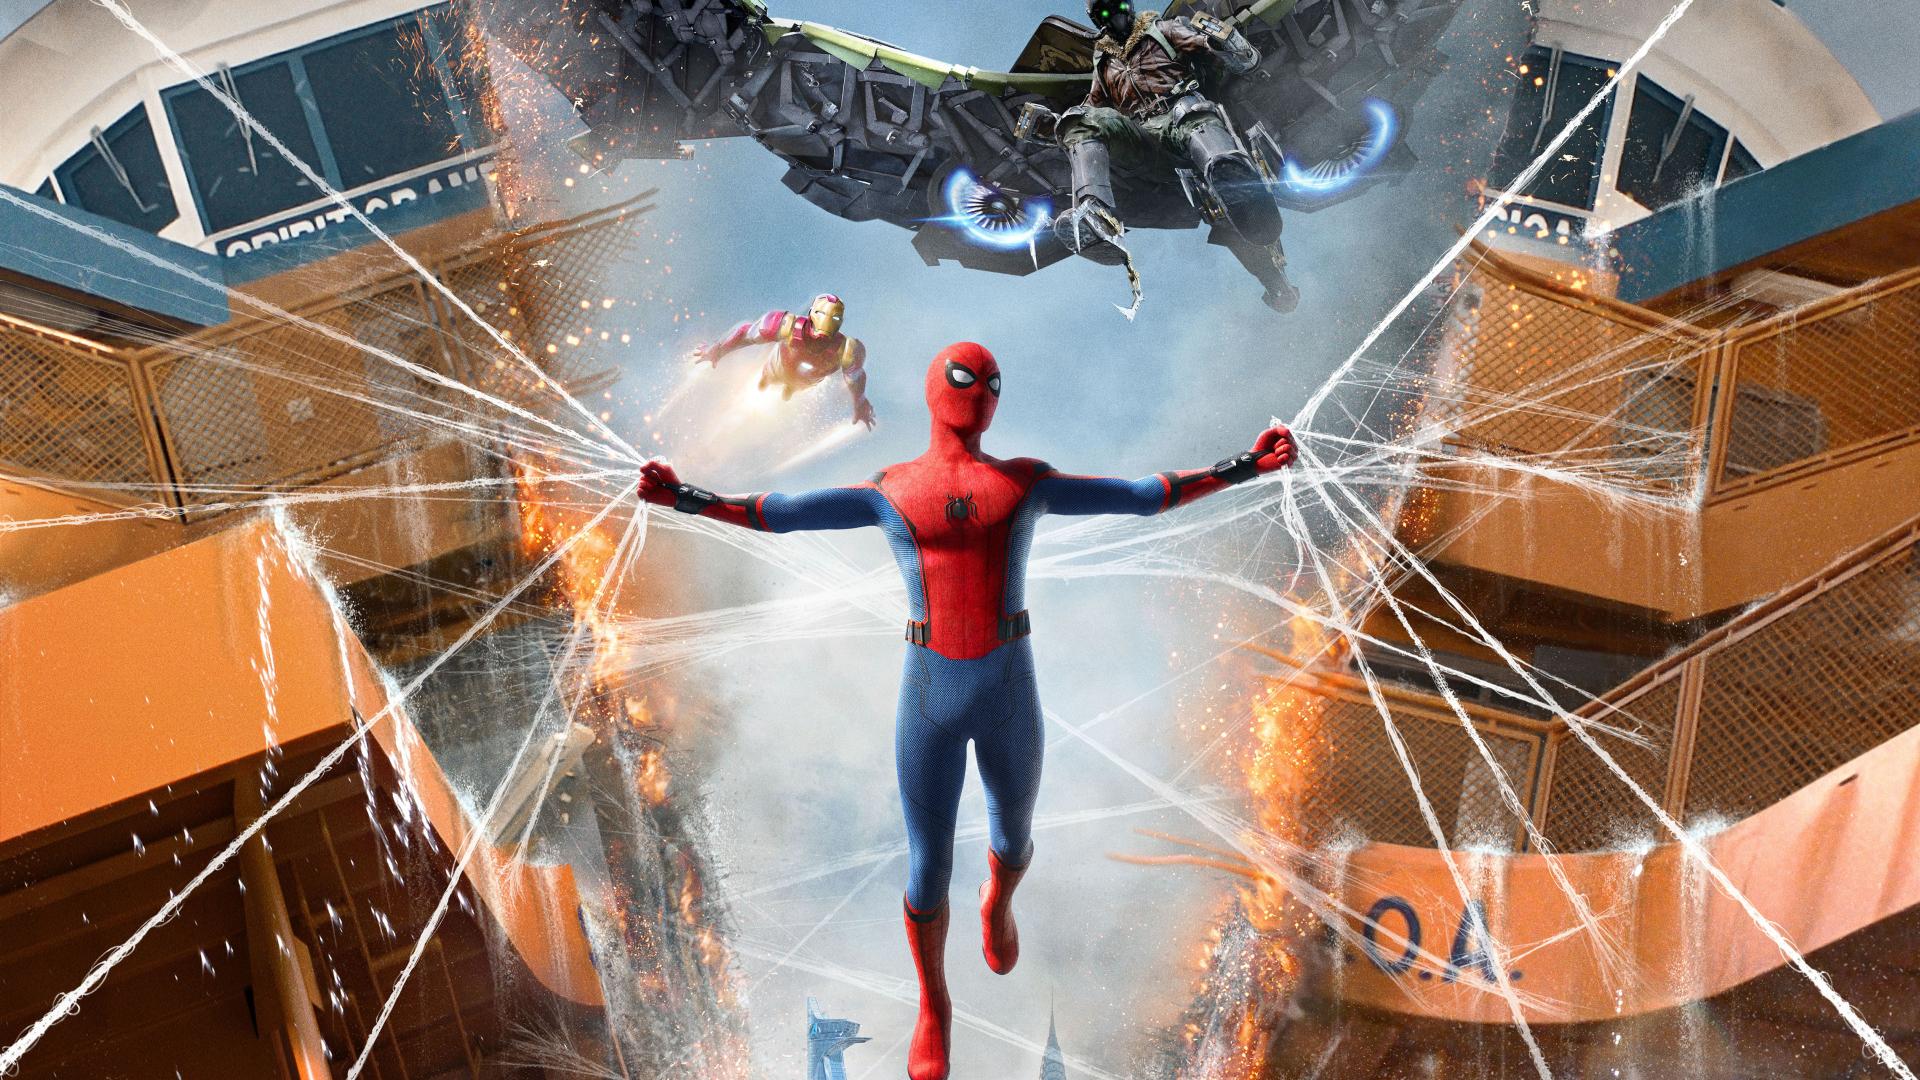 1920x1080 Spiderman Homecoming 1080p Laptop Full Hd